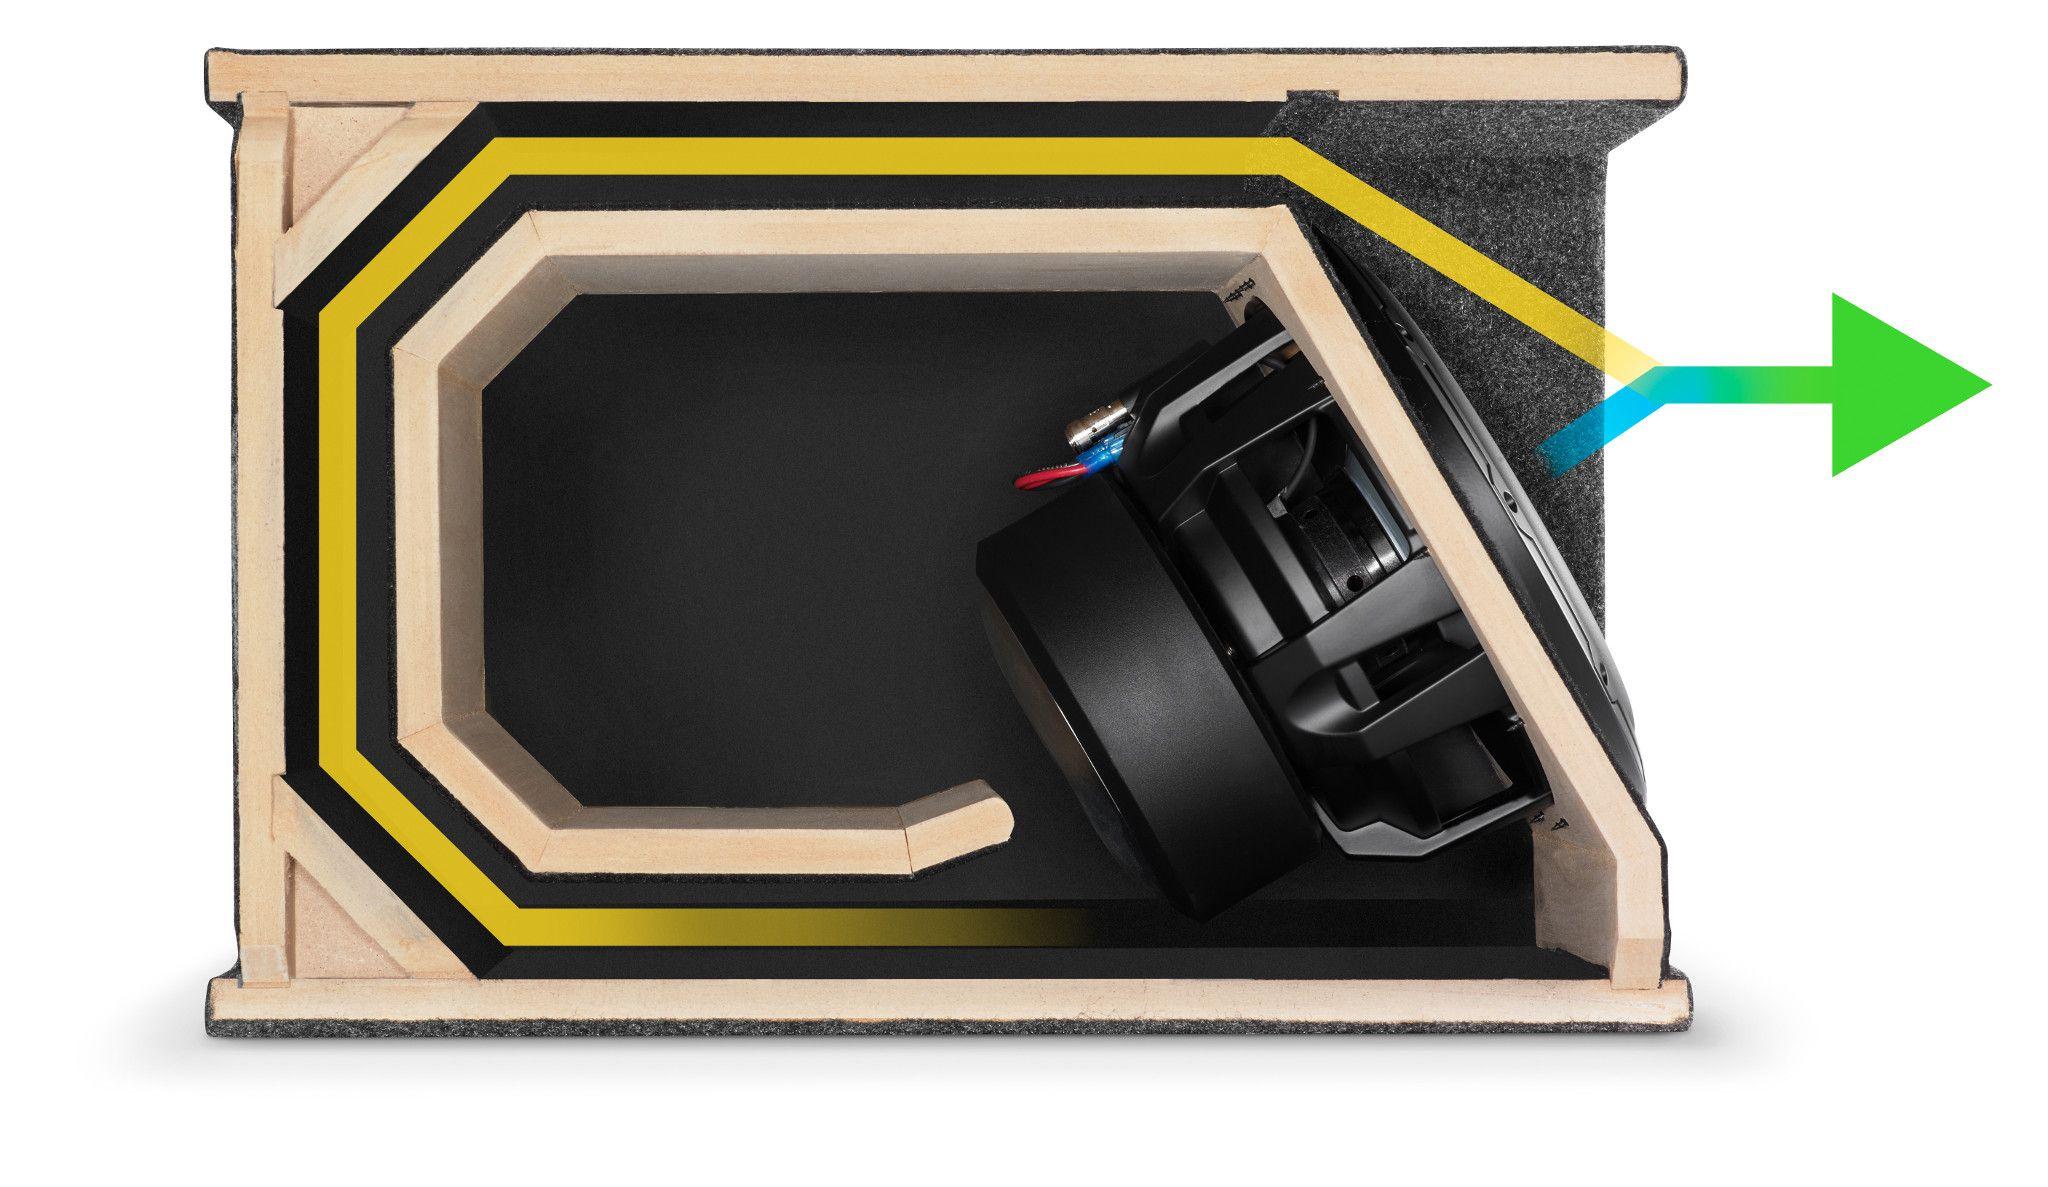 Profile Cutaway of HO110-W6v3 Enclosed Subwoofer Showing Port Coupling with Subwoofer Output